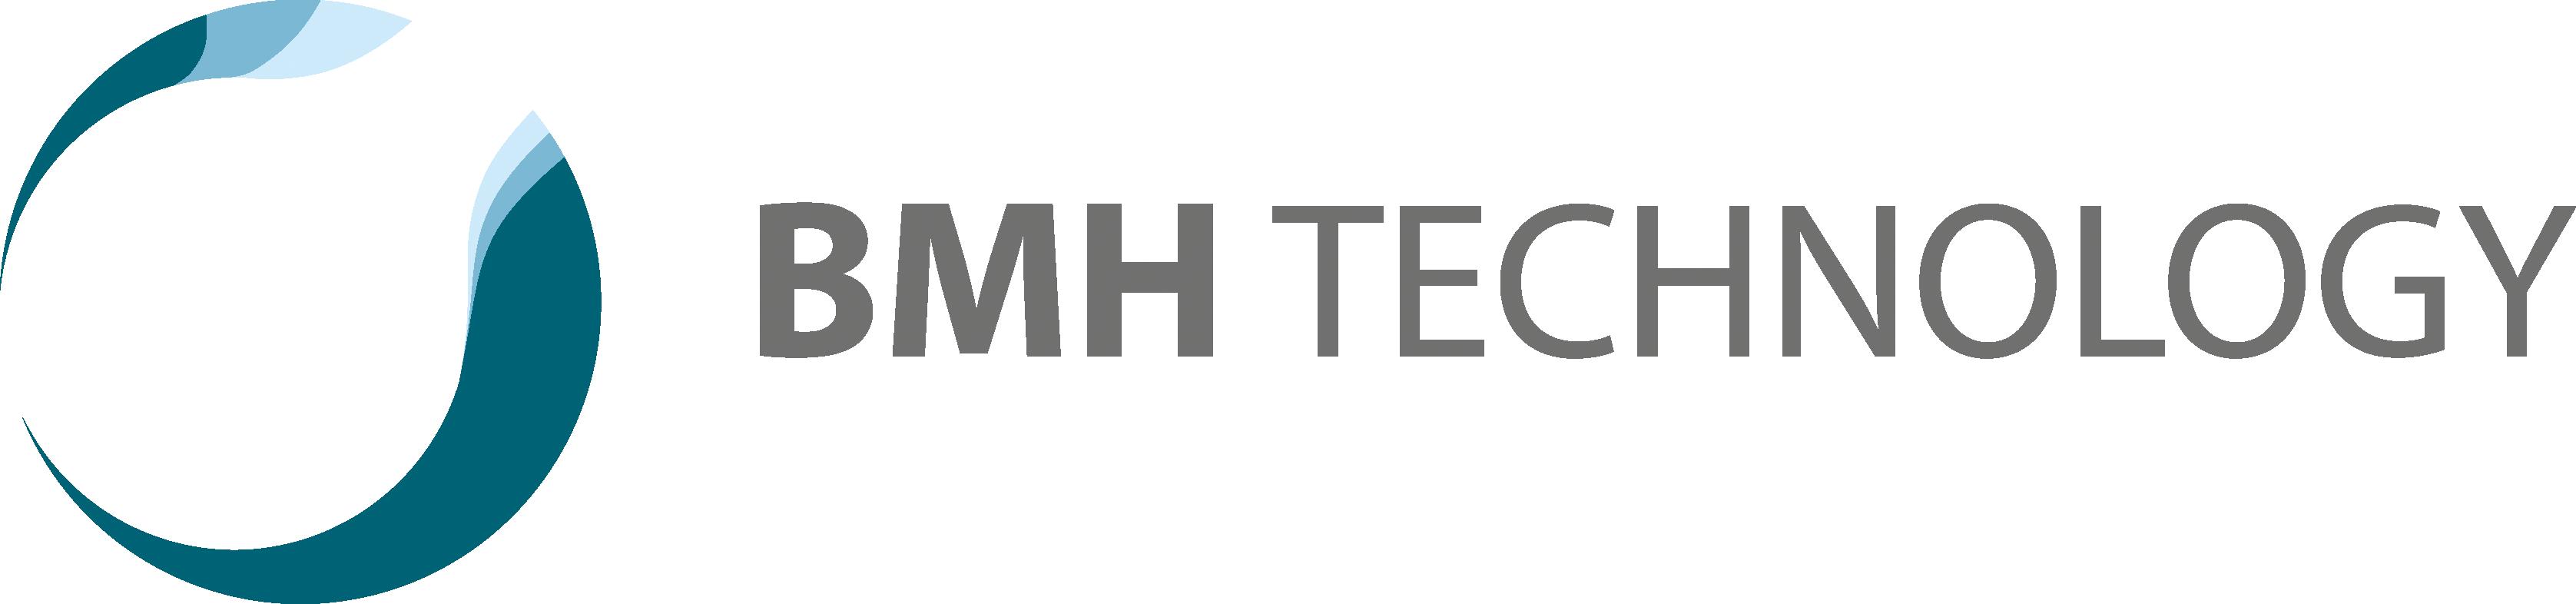 BMH Technology Poland